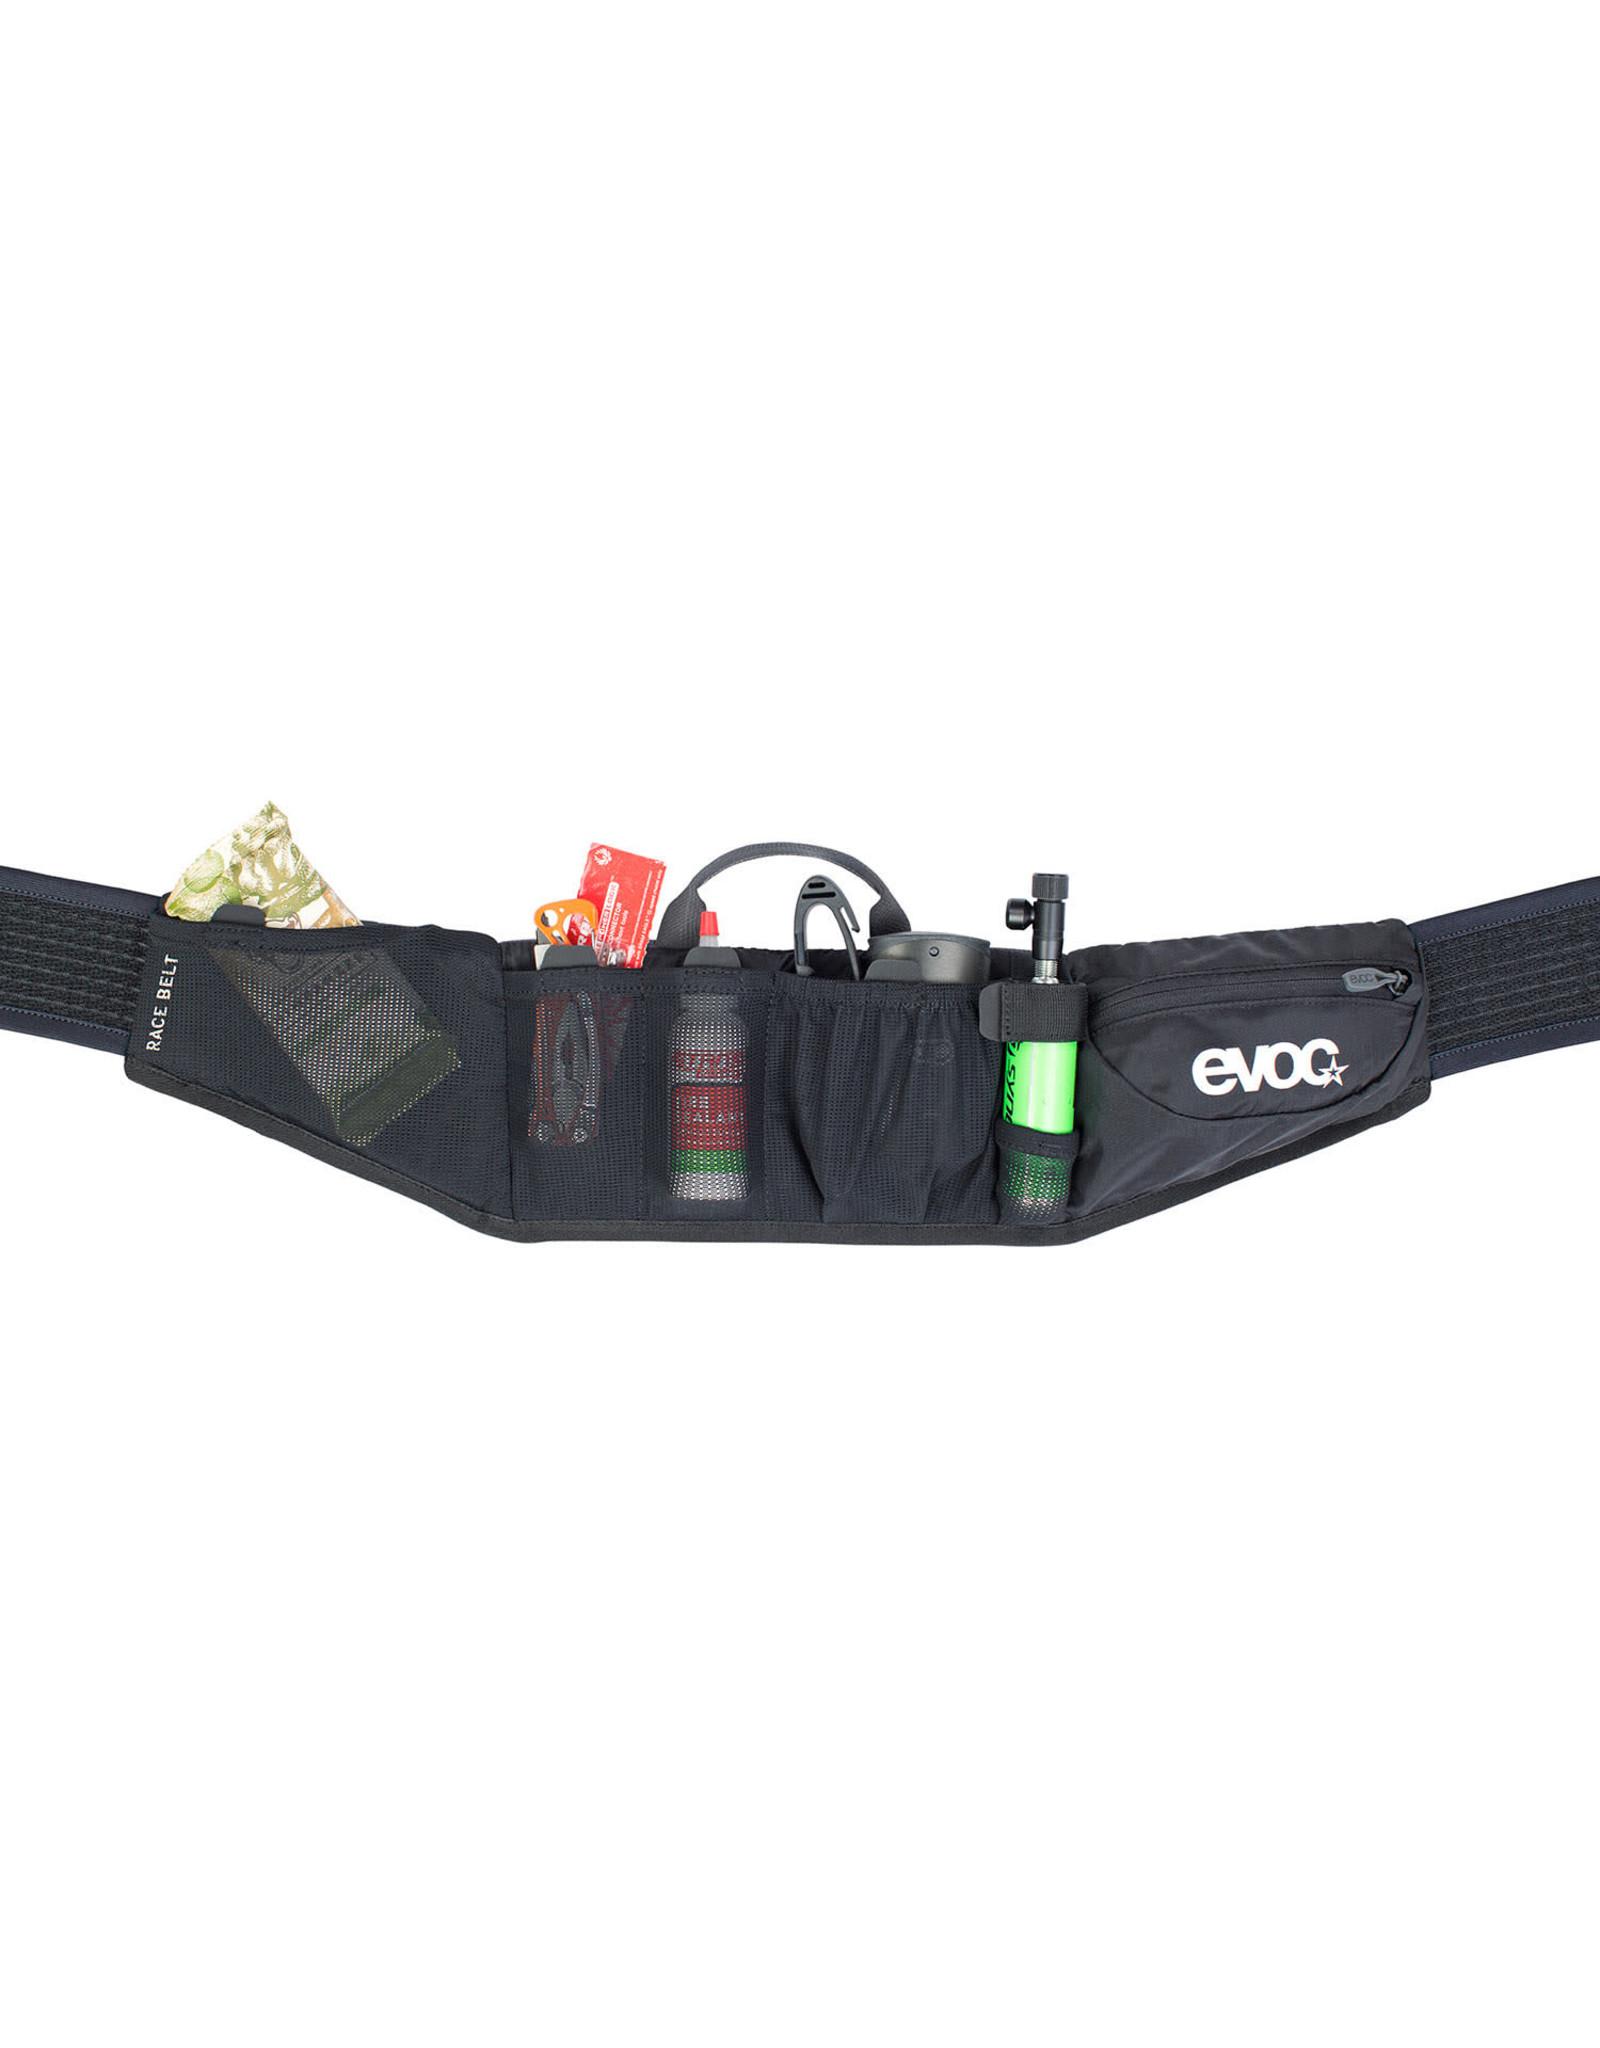 EVOC EVOC, Race Belt, Sac, 0.8L, Noir